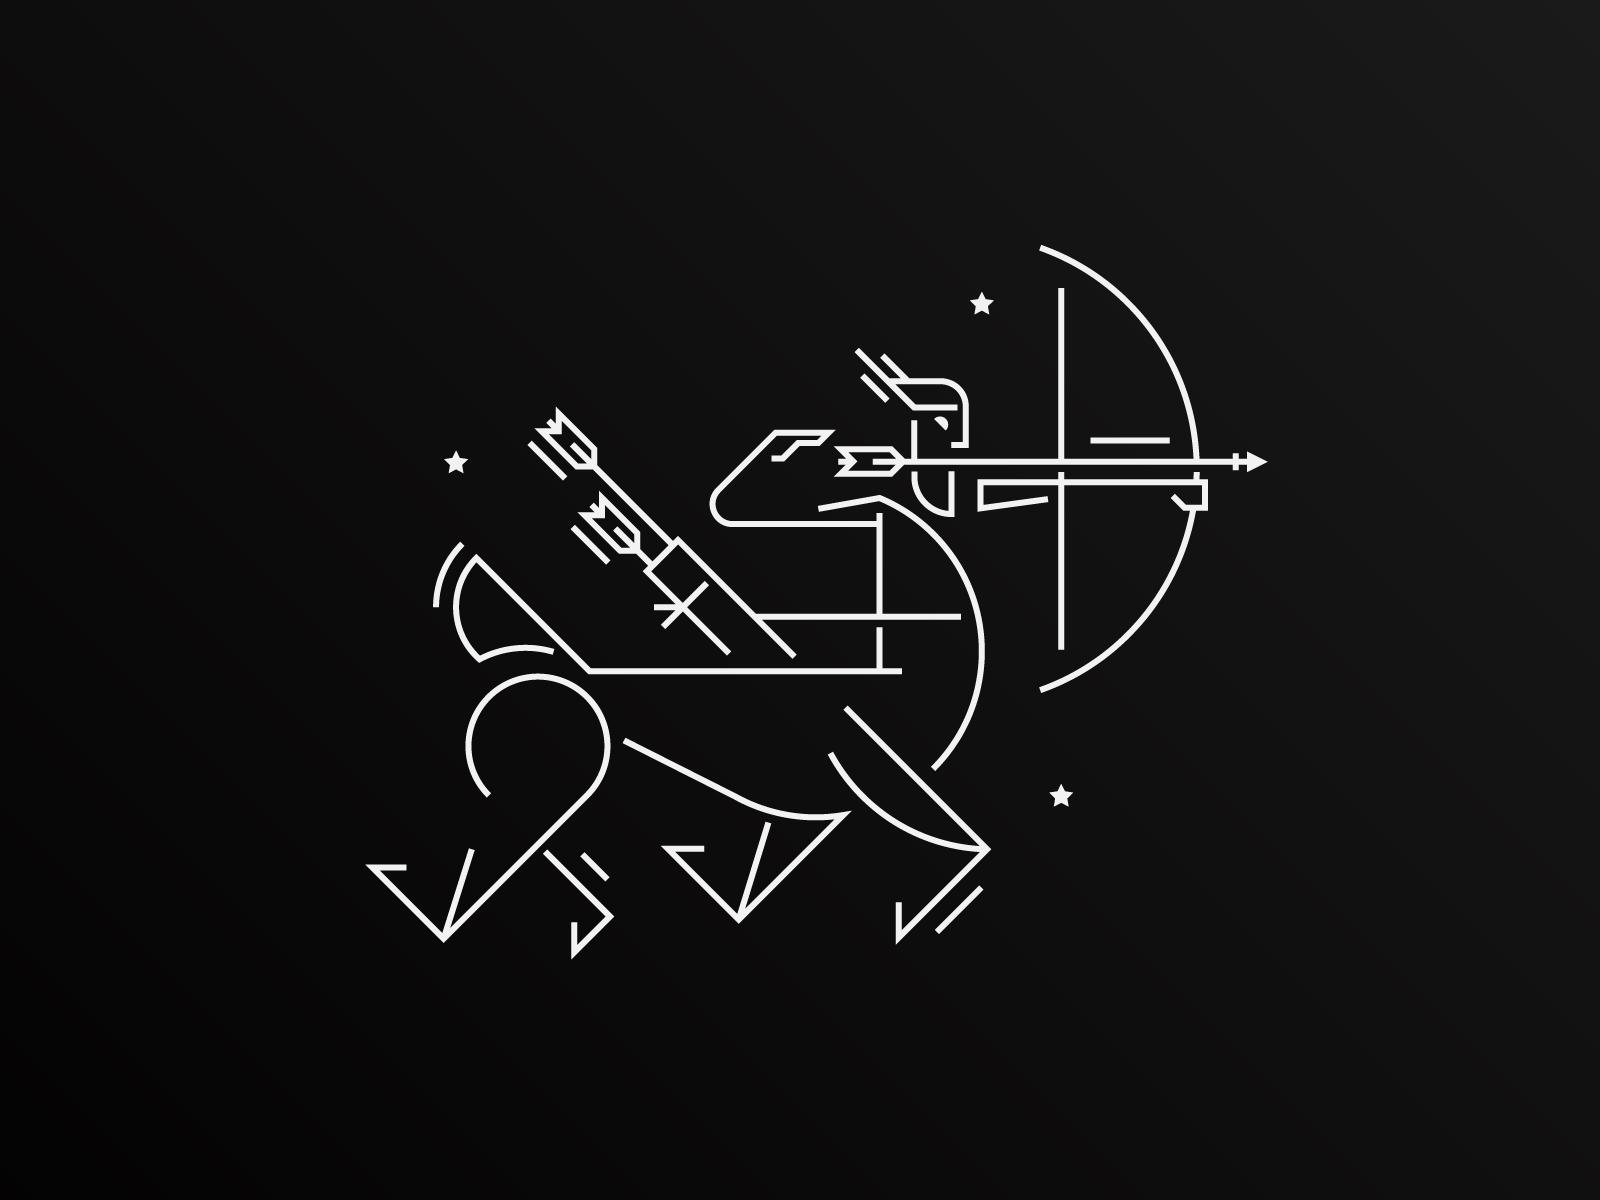 Sagittarius_1.0.jpg